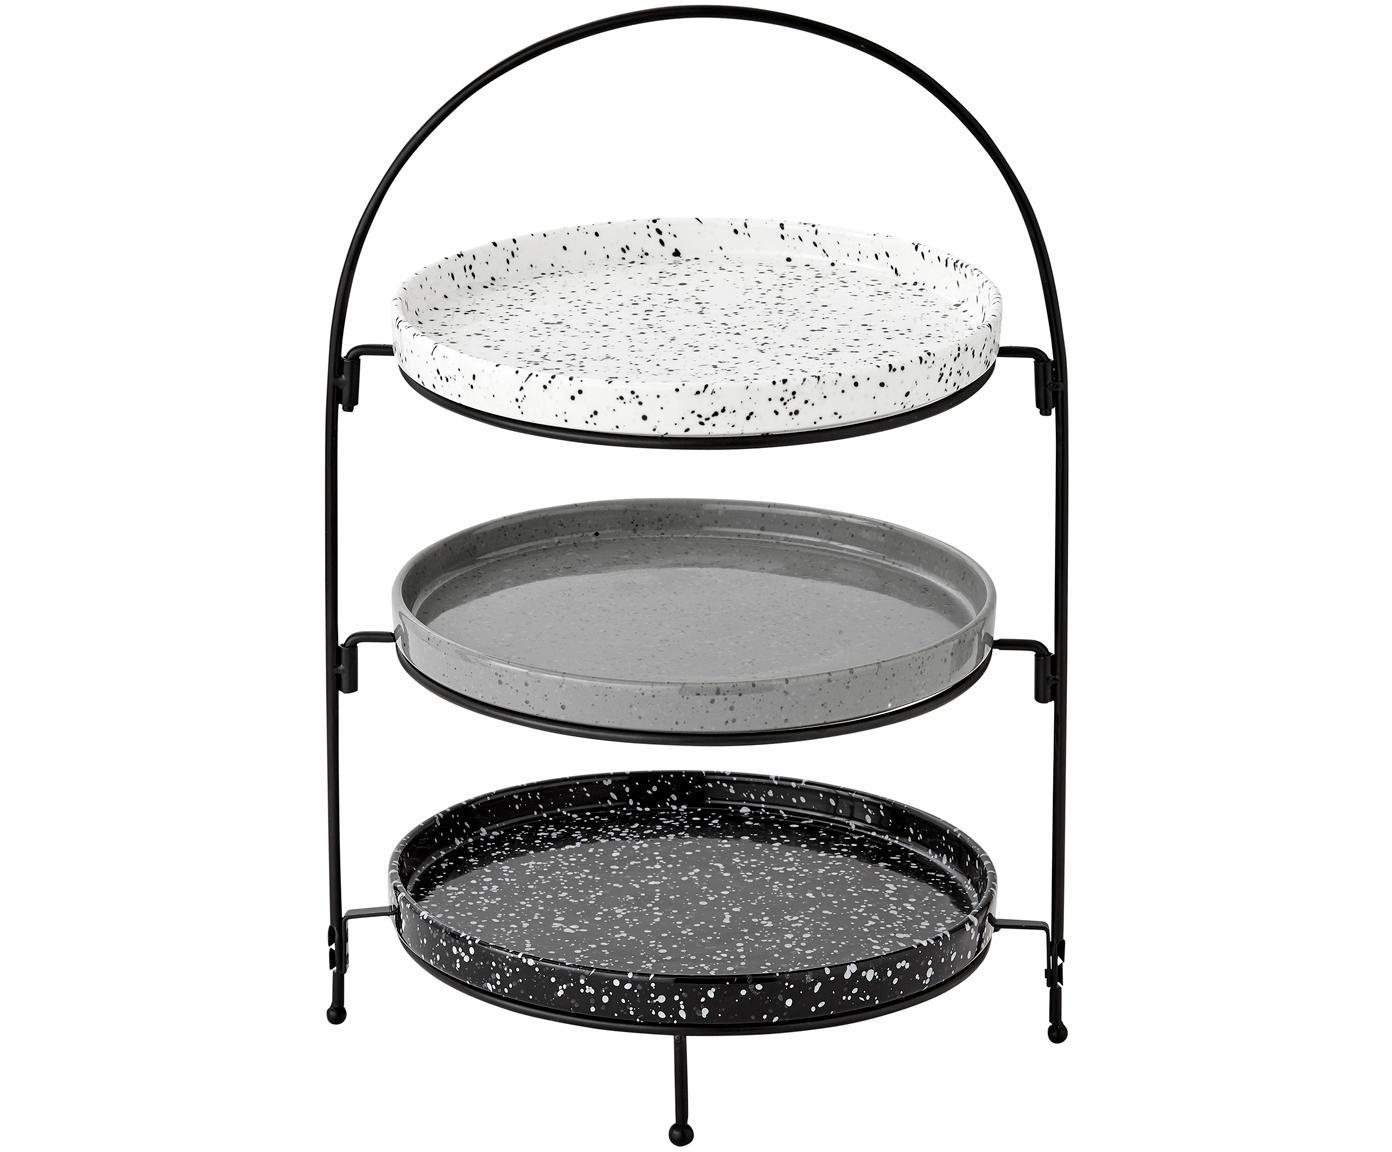 Etagere Tazzo, Gestell: Metall, lackiert, Schwarz, Weiss, Grau, 30 x 55 cm